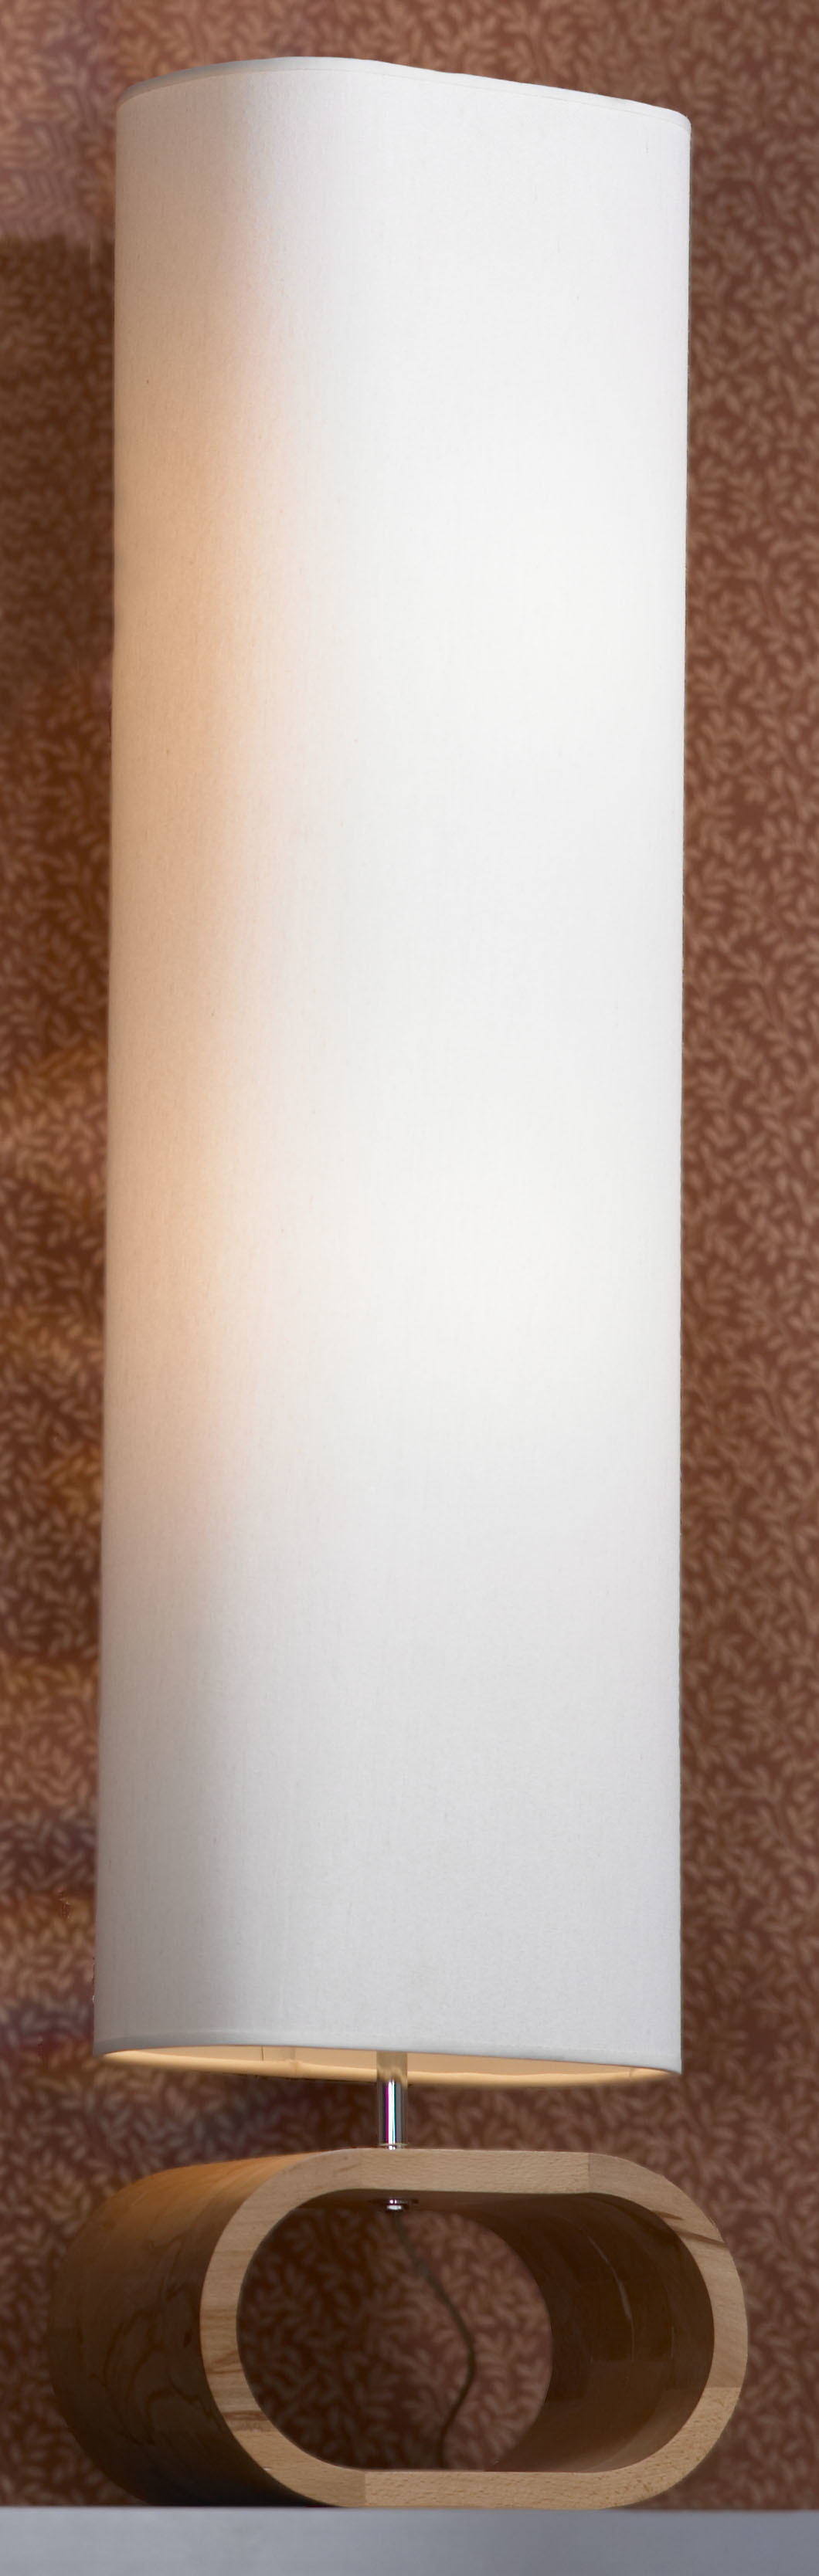 Торшер Lussole Loft Nulvi LSF-2115-02, IP21, 2xE27x60W, коричневый, белый, дерево, текстиль - фото 1